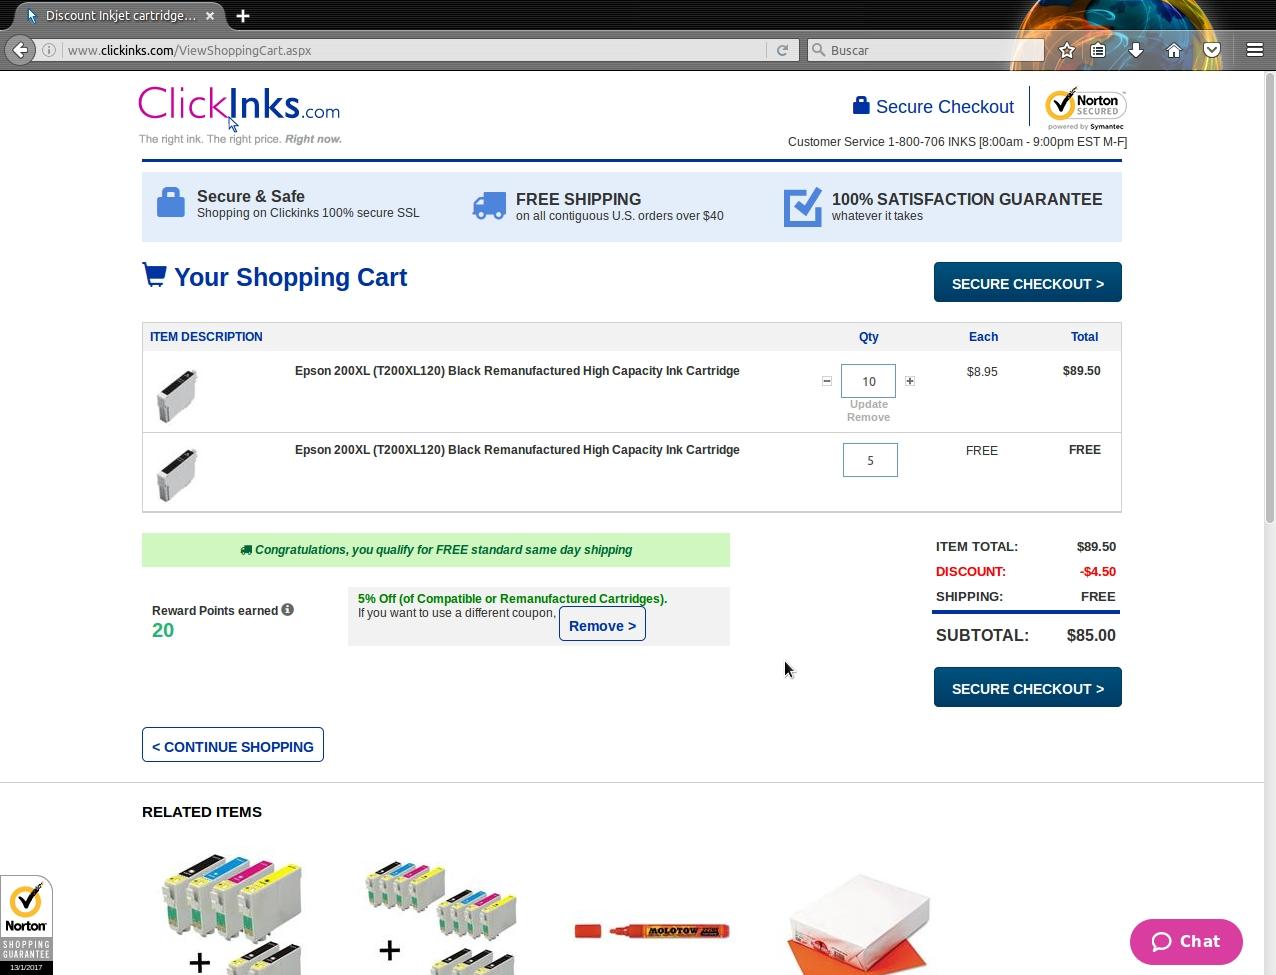 Clickinks discount coupons